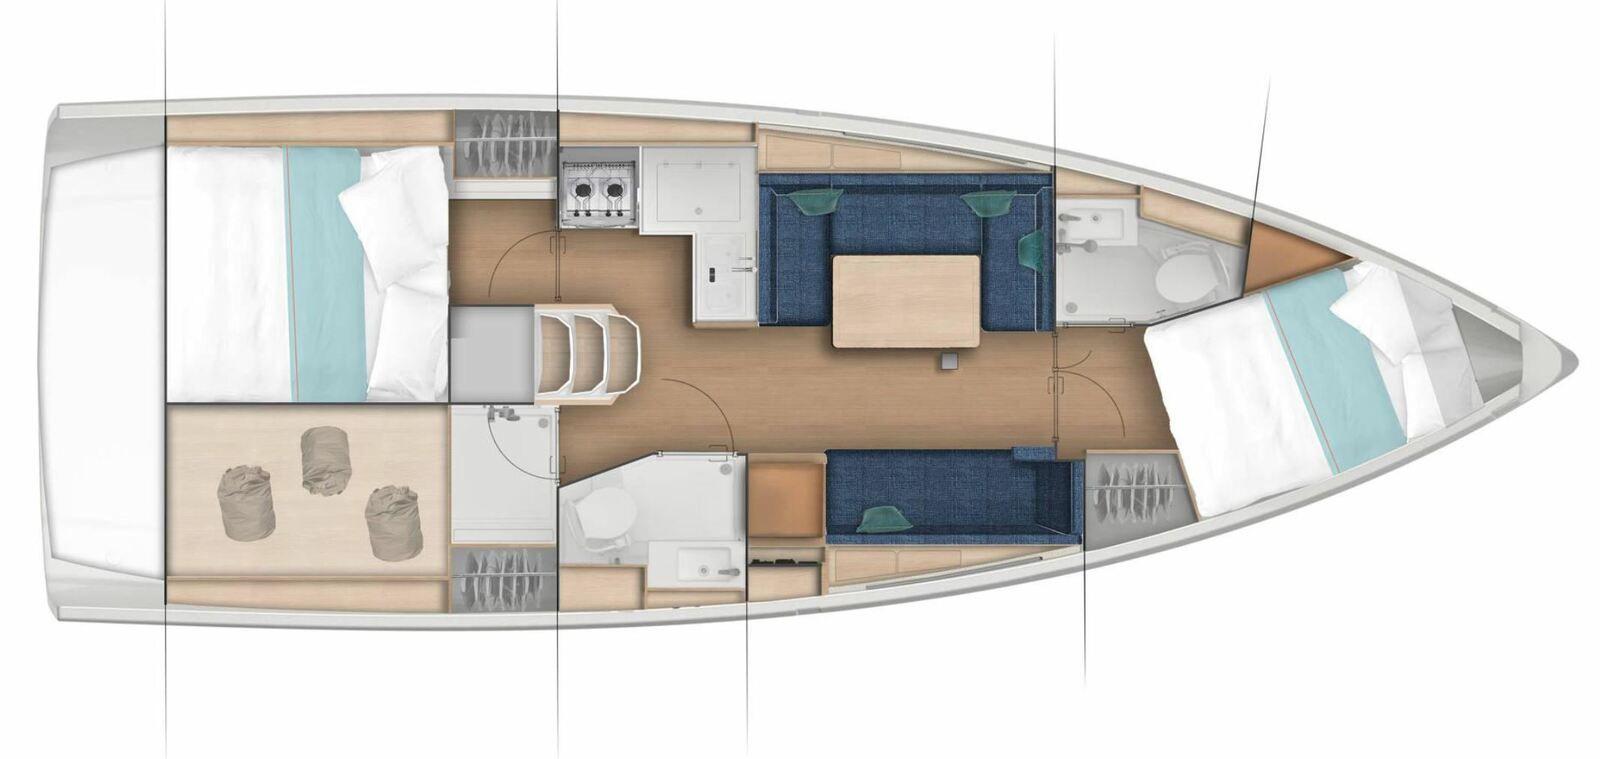 Yachting - Jeanneau unveils the Jeanneau Sun Odyssey 380